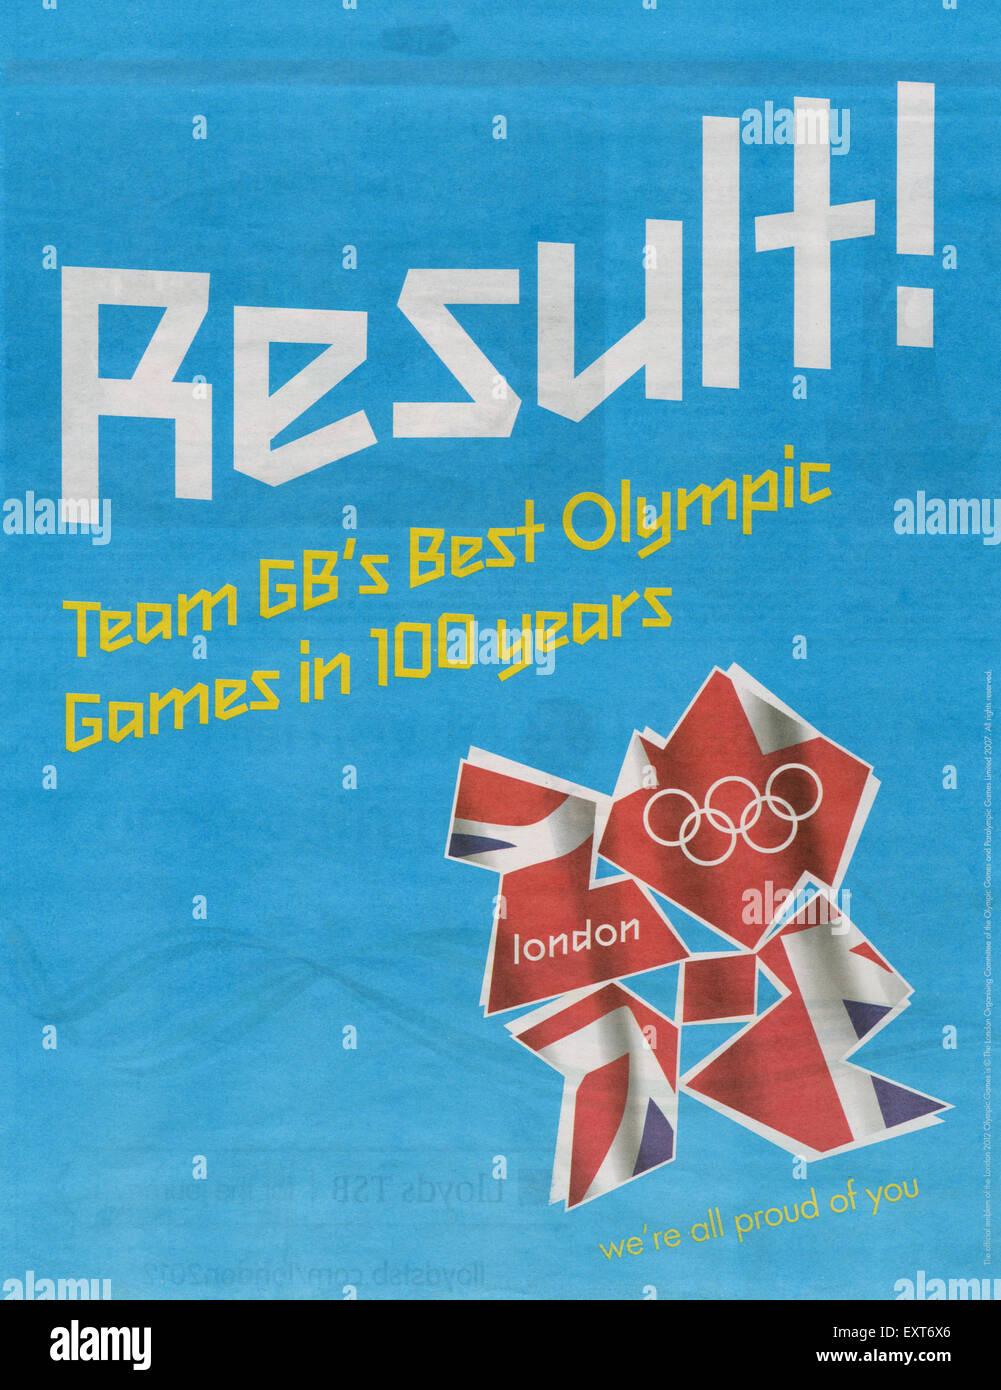 2000s UK 2012 Olympic Bid Newspaper Advert - Stock Image